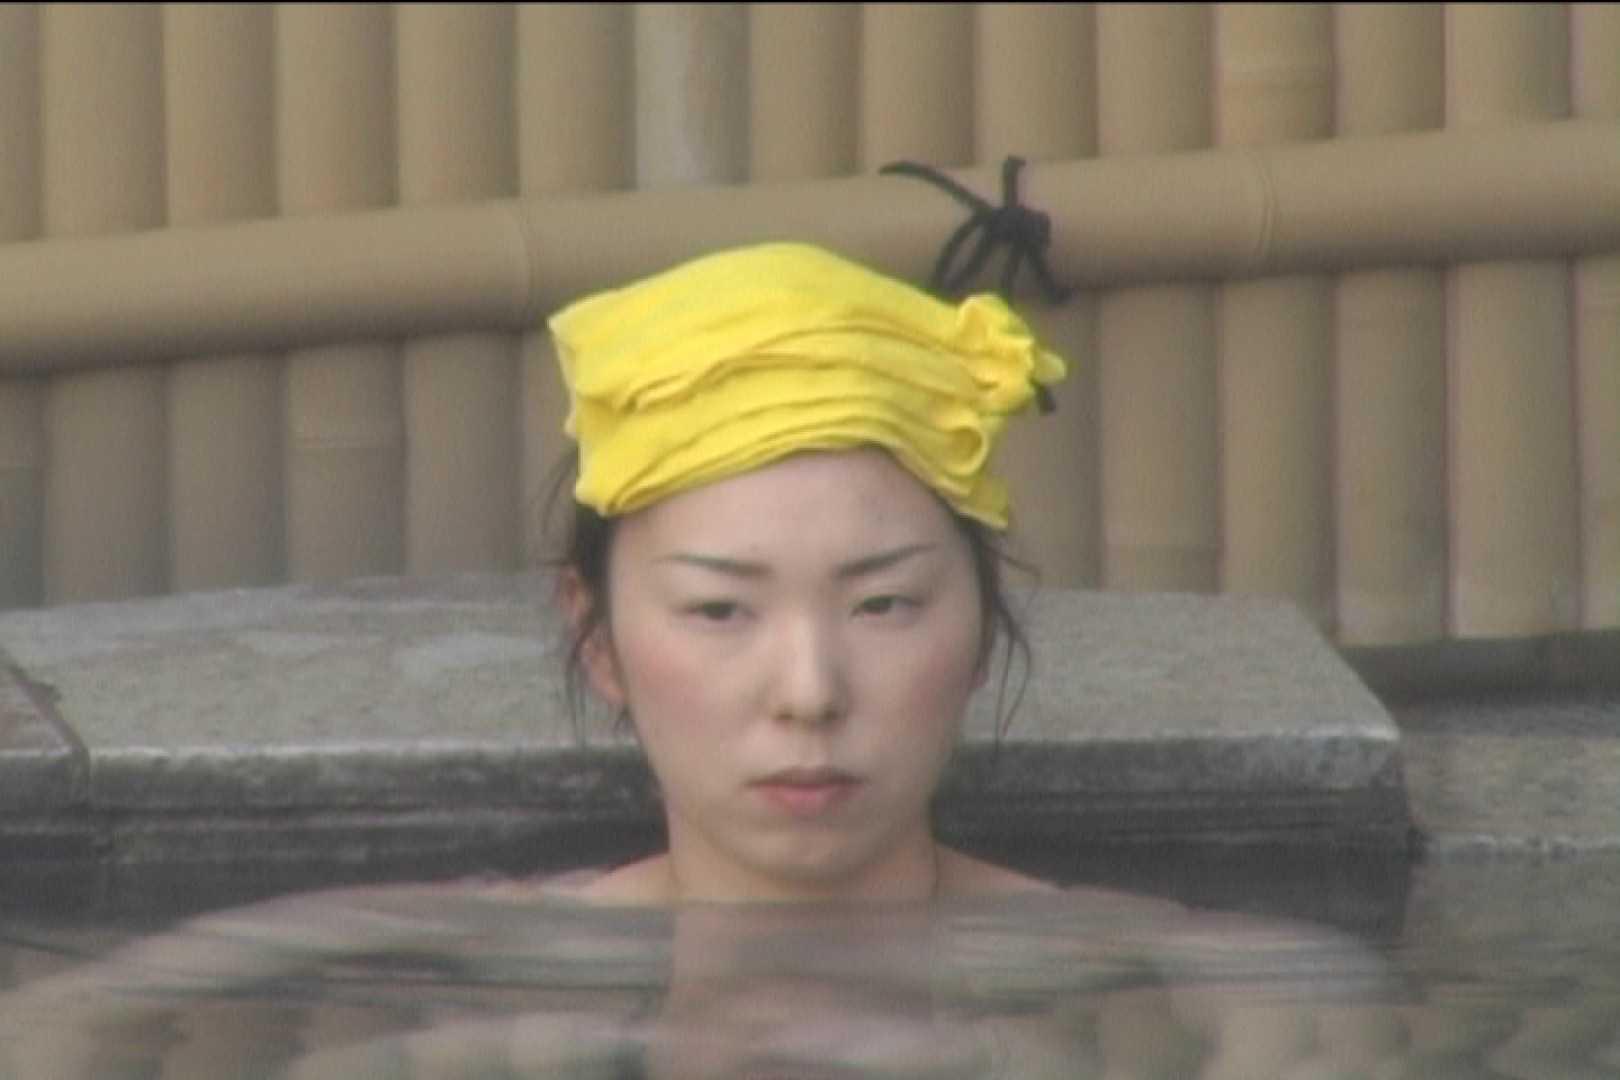 Aquaな露天風呂Vol.529 盗撮映像  51Pix 28